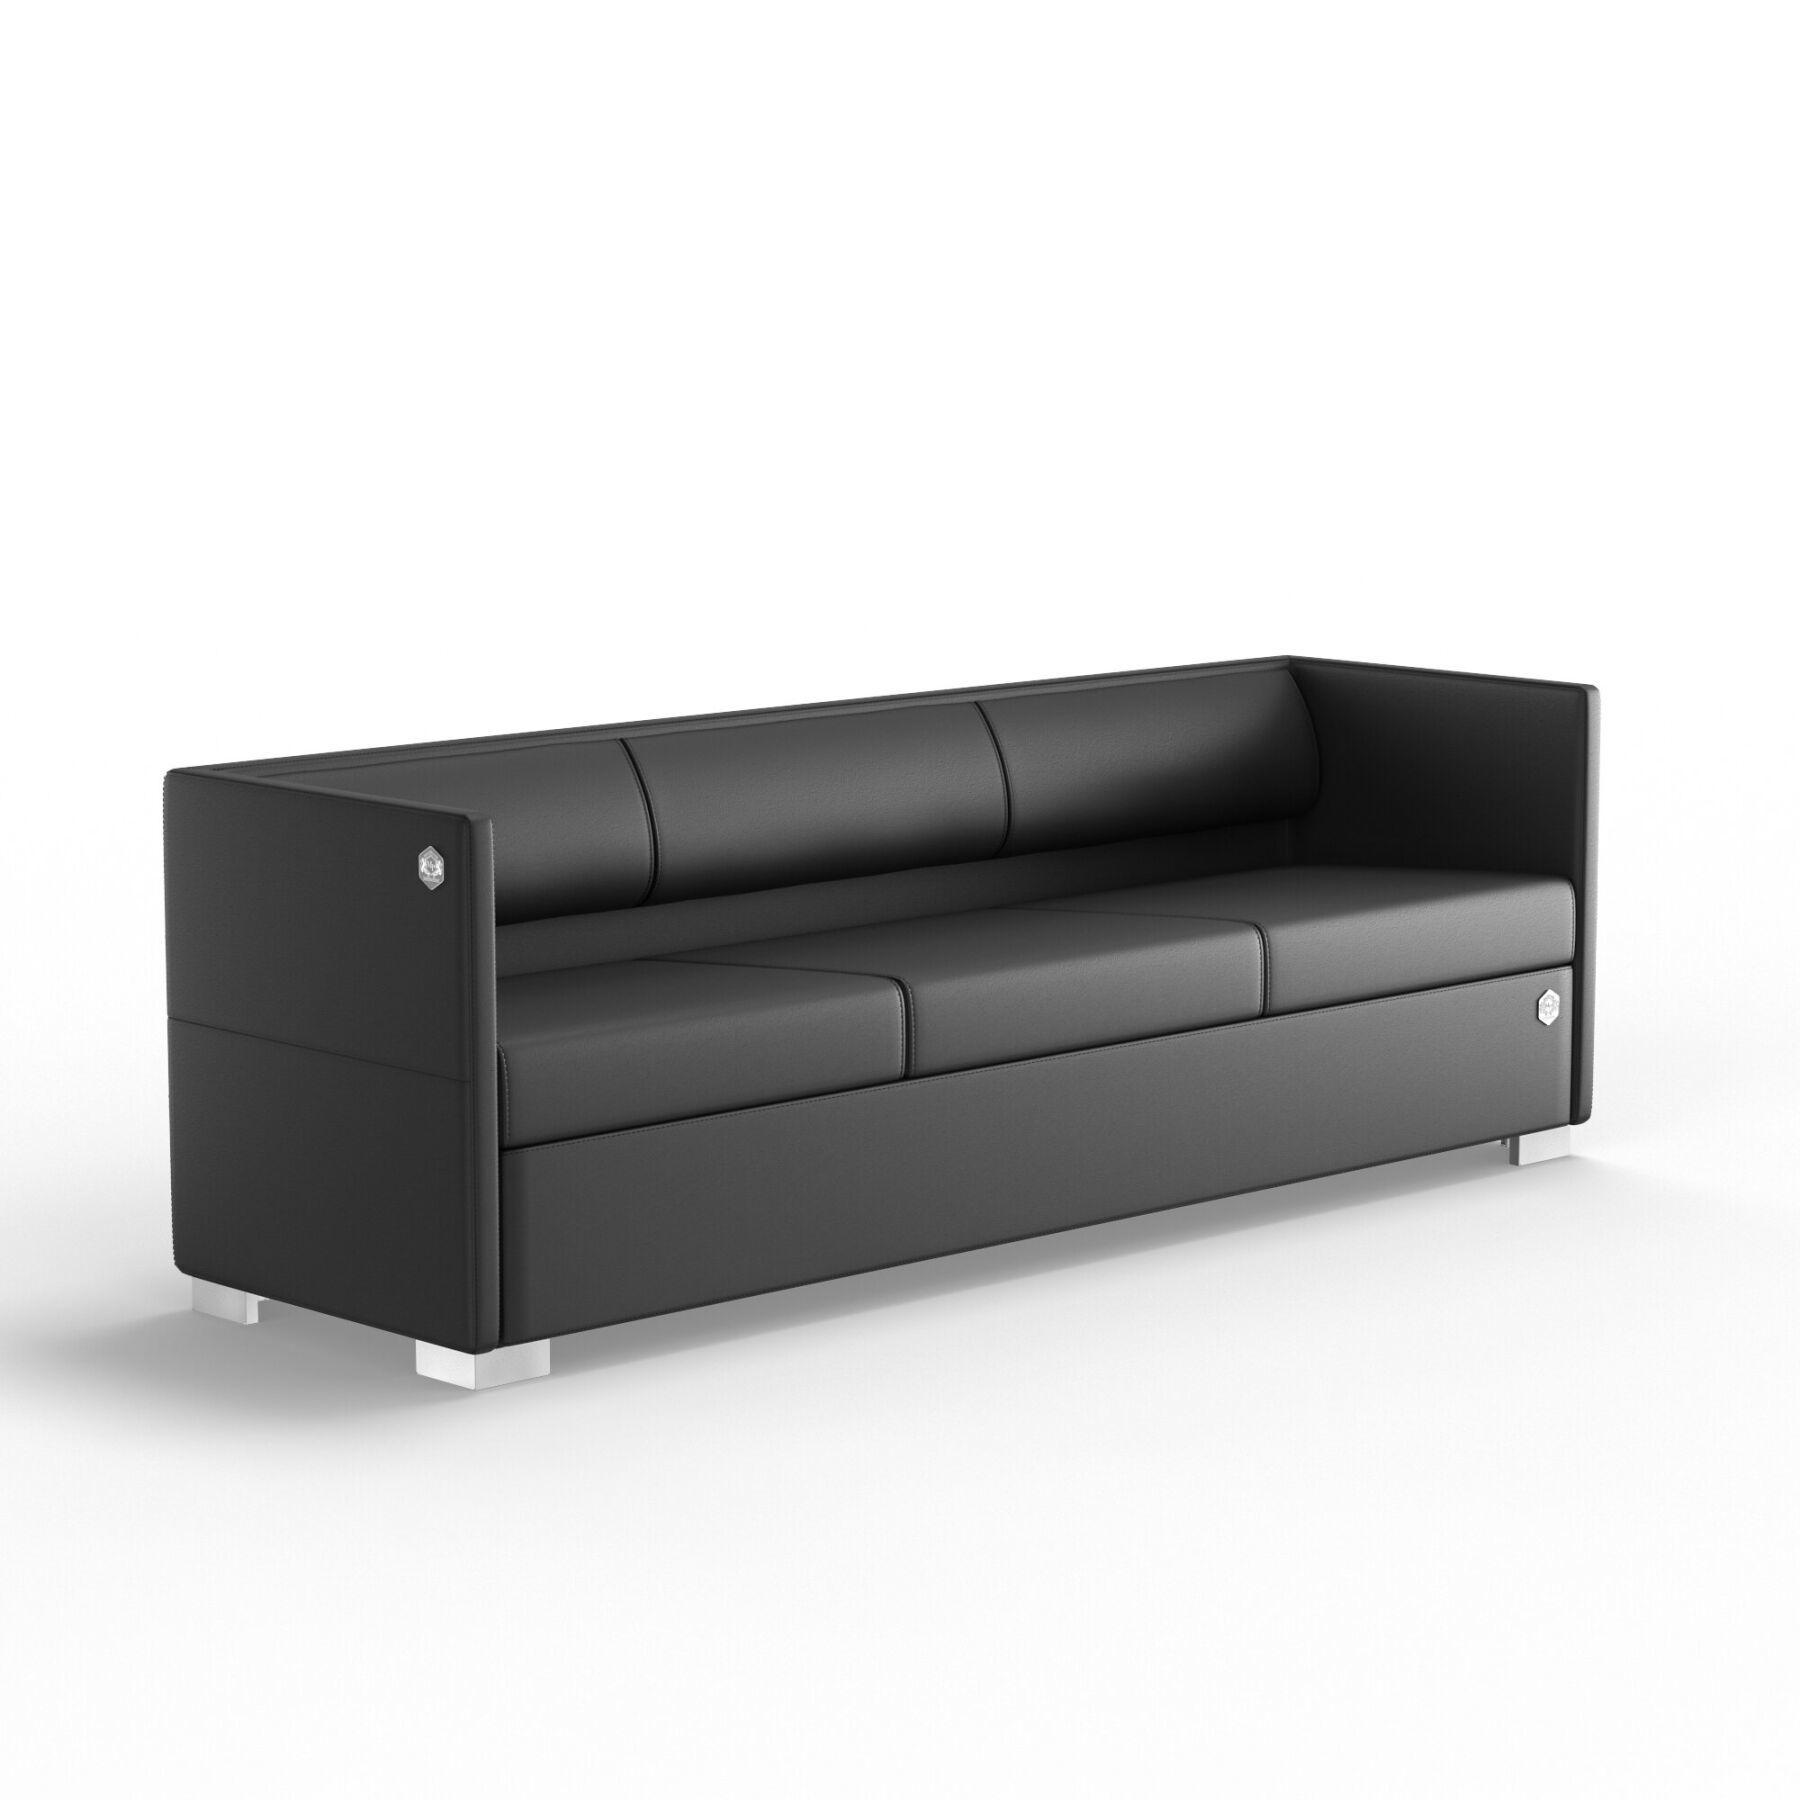 Трехместный диван KULIK SYSTEM LOUNGE Кожа 3